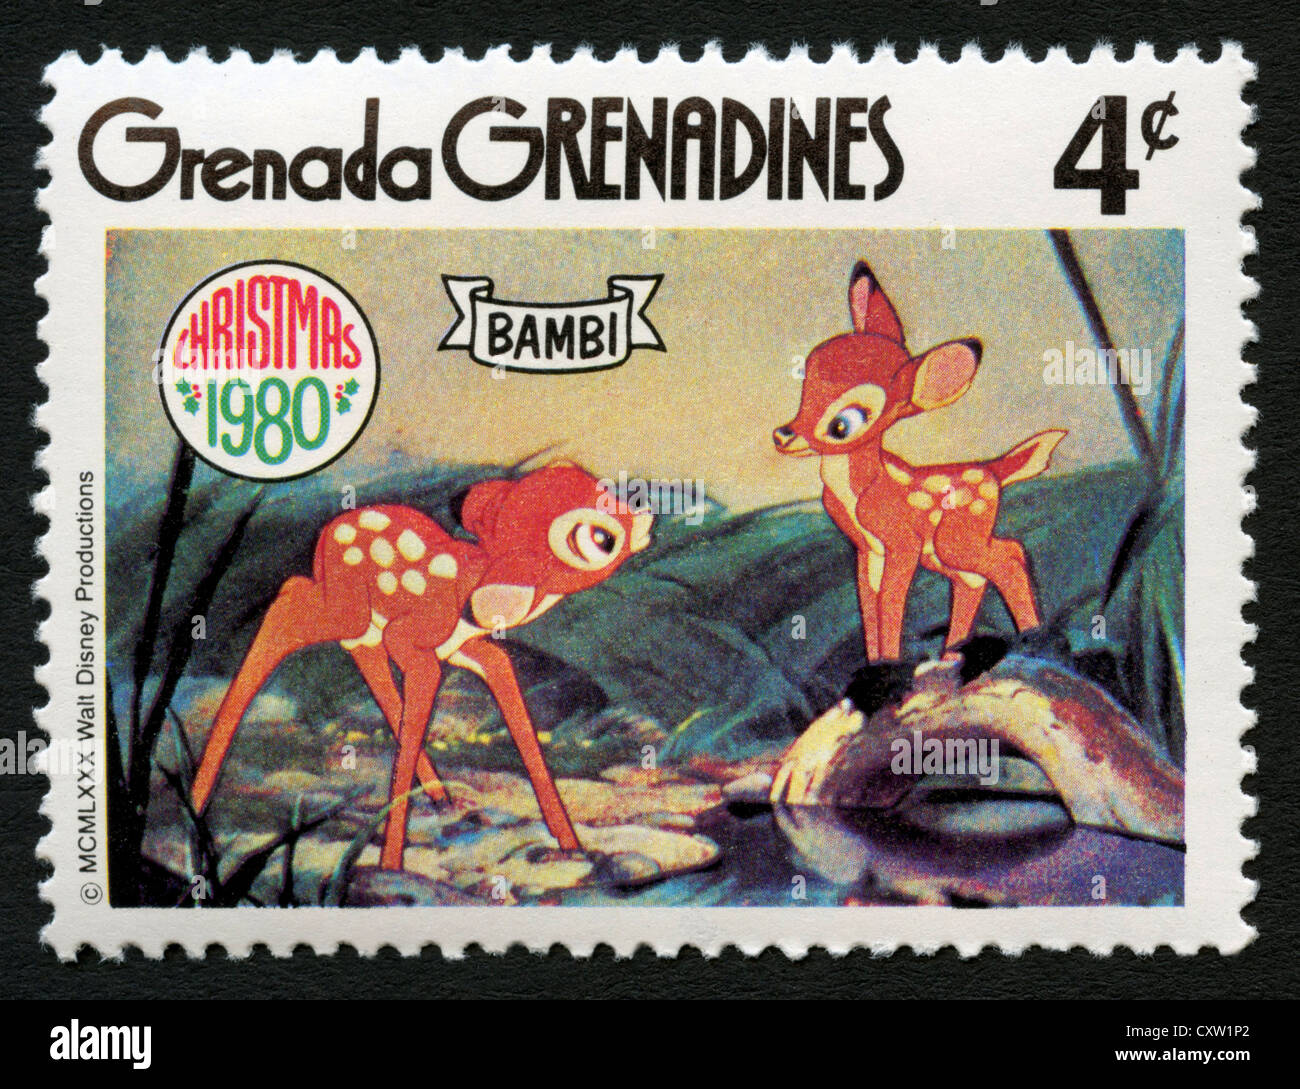 Grenada francobollo cartoni animati disney bambi foto & immagine